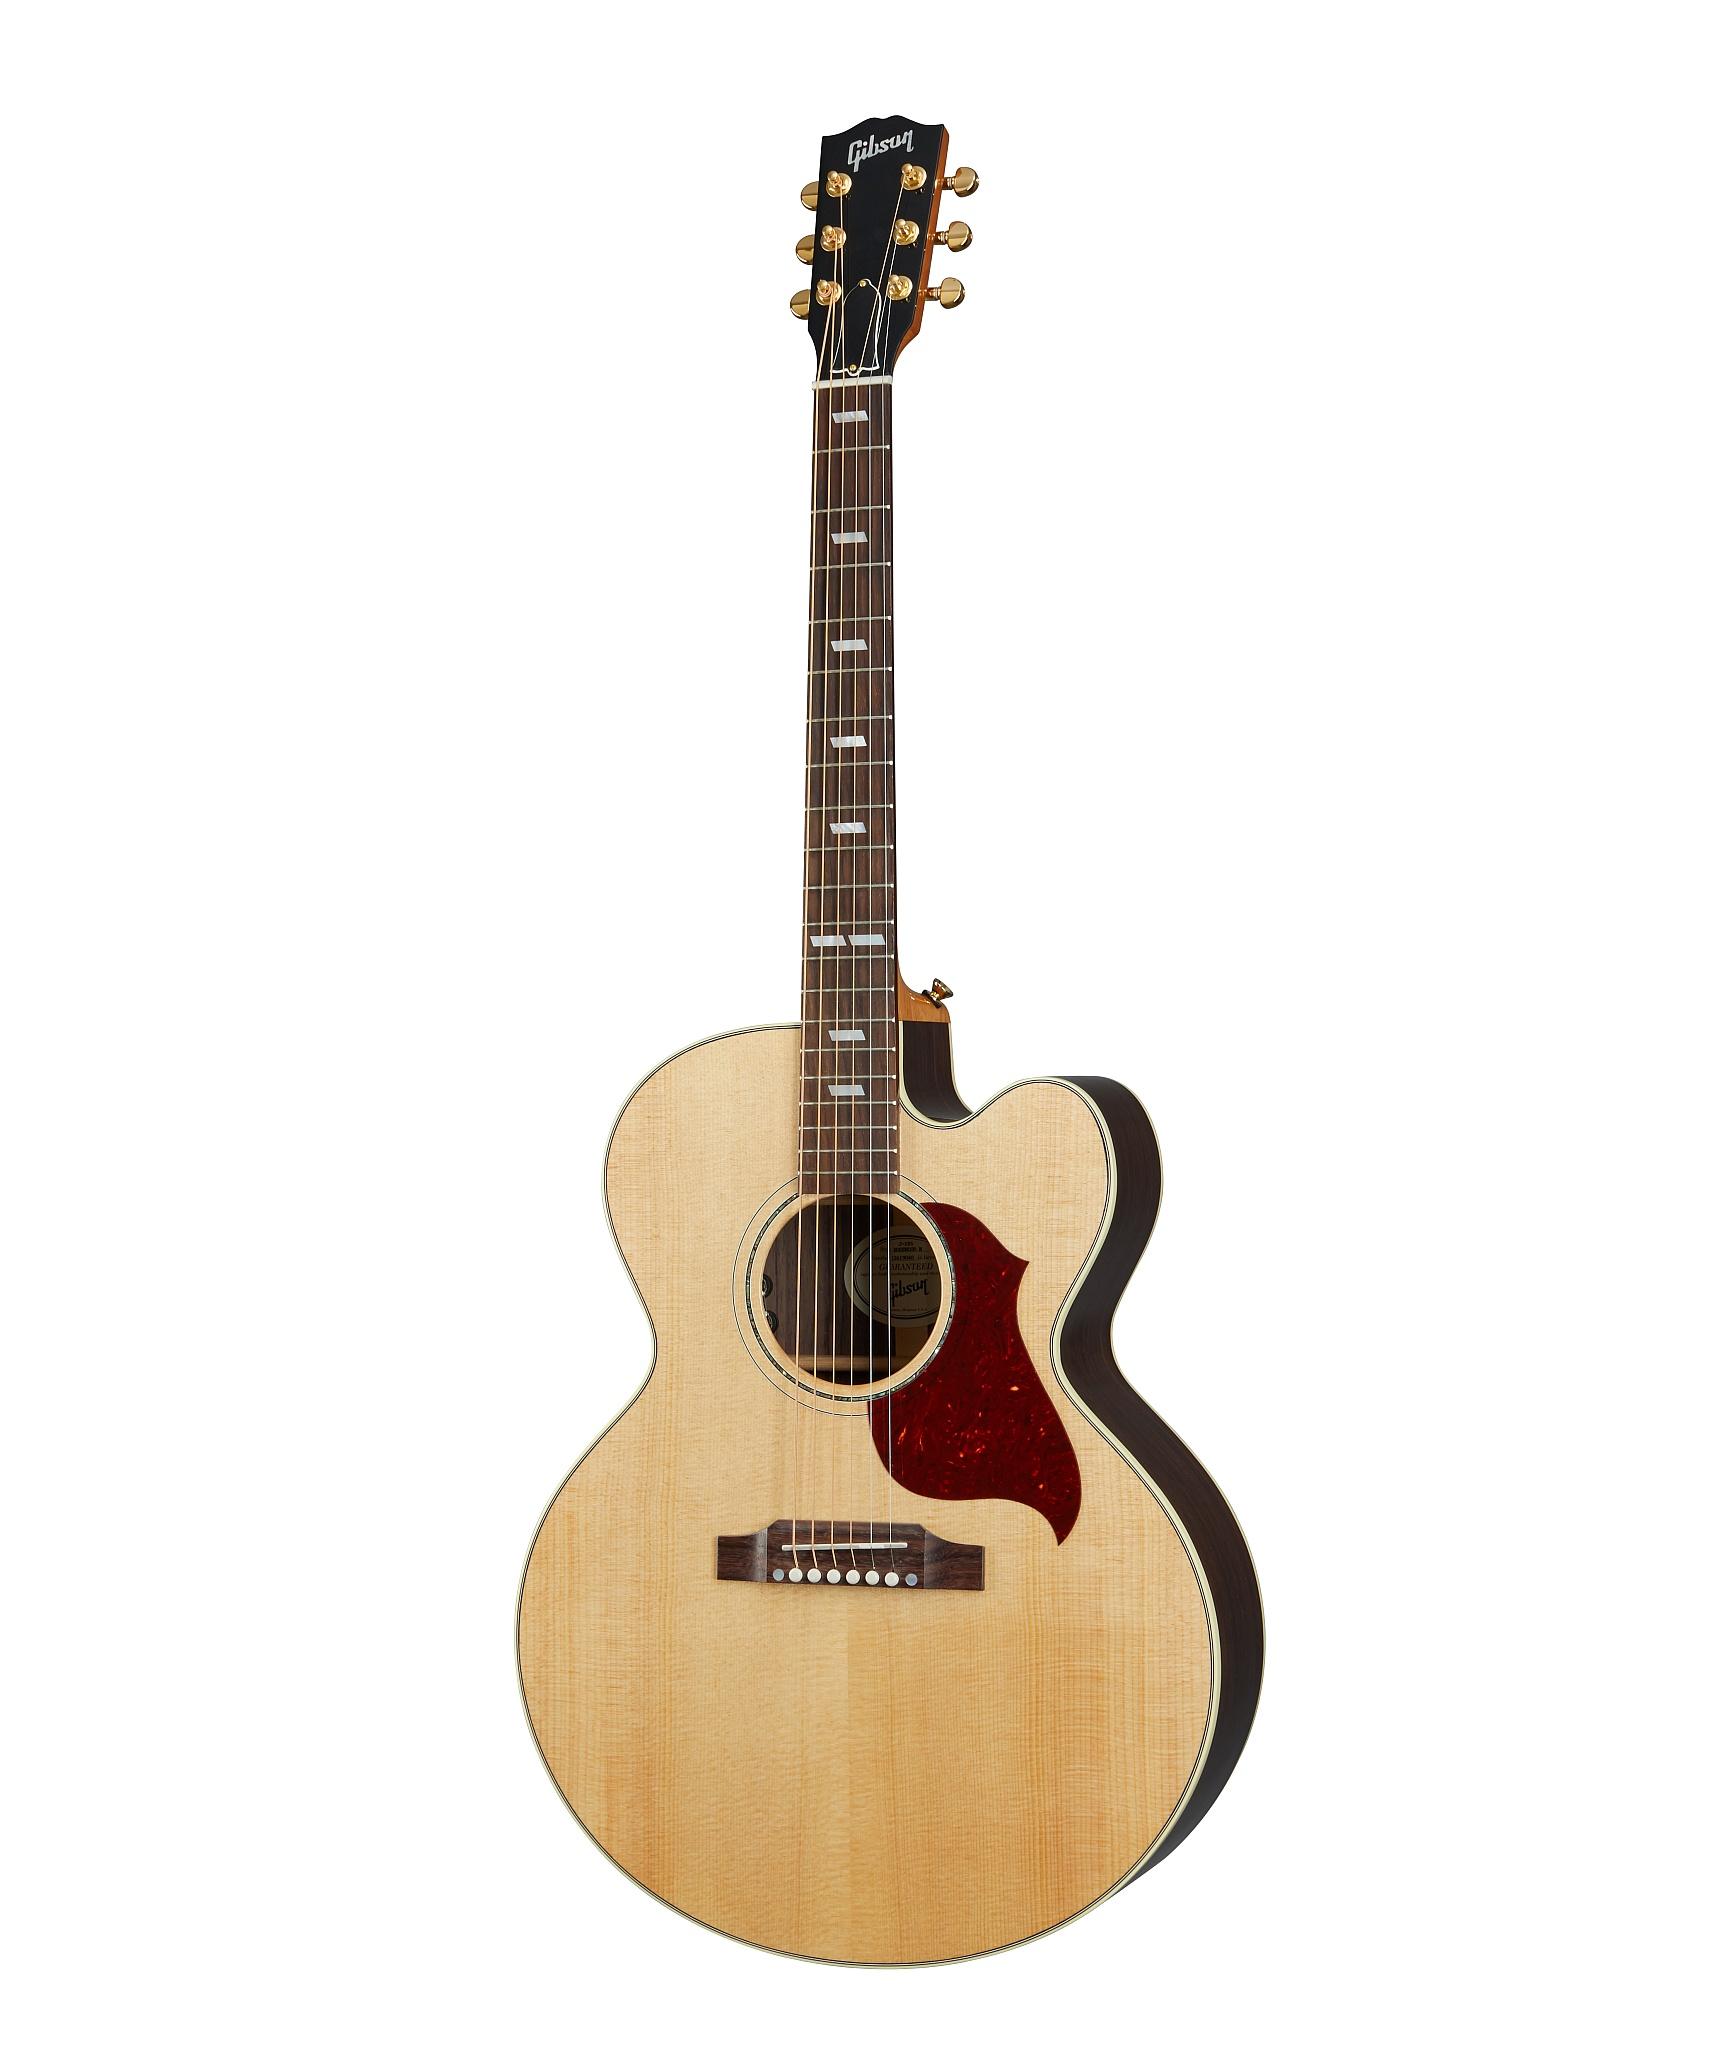 Gibson J-185 EC Modern Rosewood Antique Natural inklusive Koffer